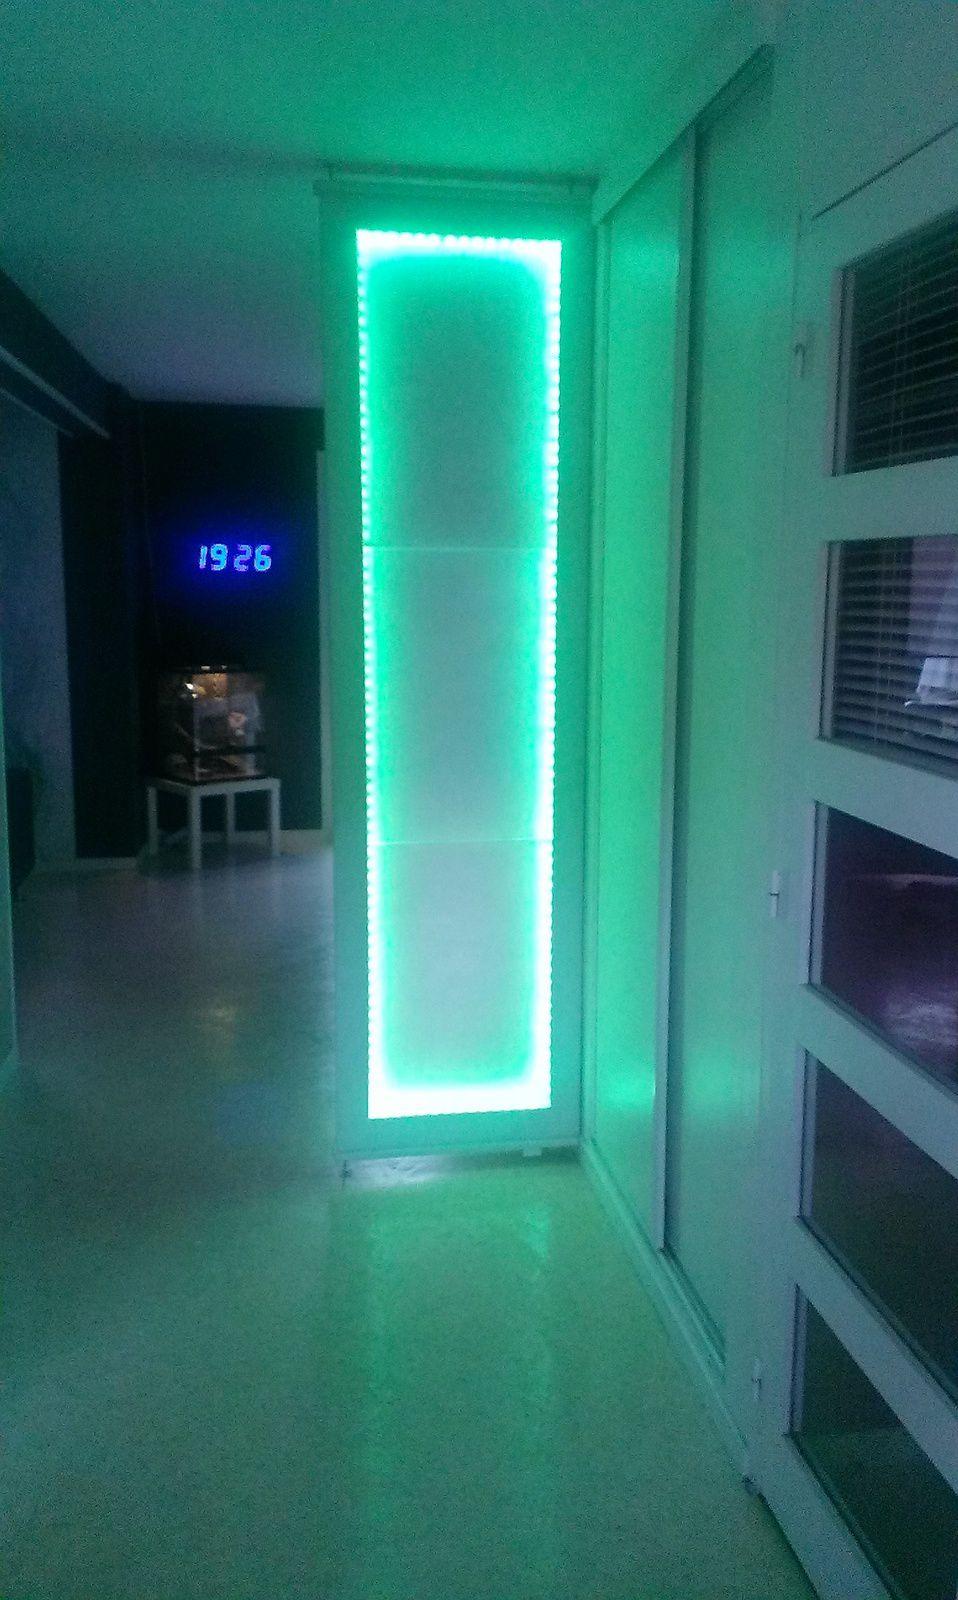 cloison amovible lumineuse b r menuiserie. Black Bedroom Furniture Sets. Home Design Ideas